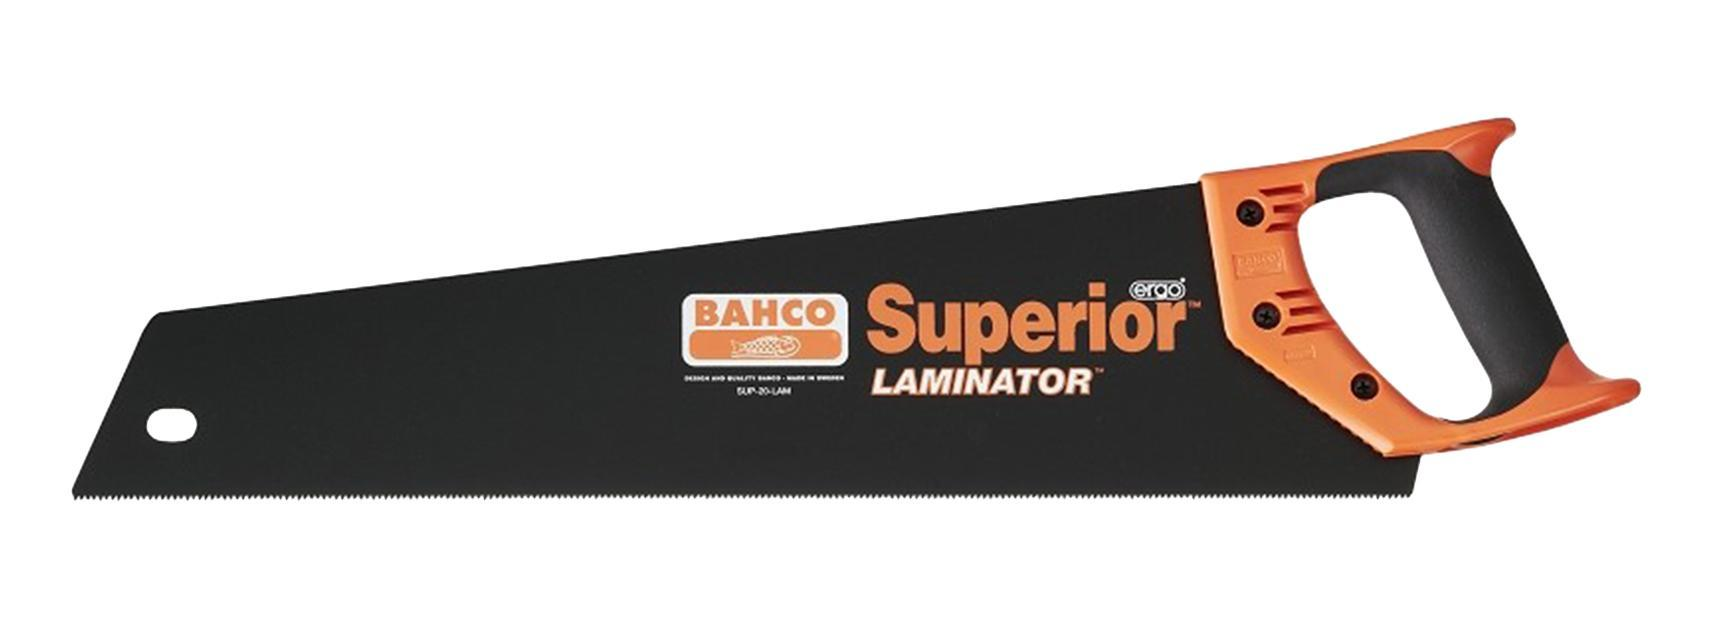 Ножовка Bahco Sup-20-lam